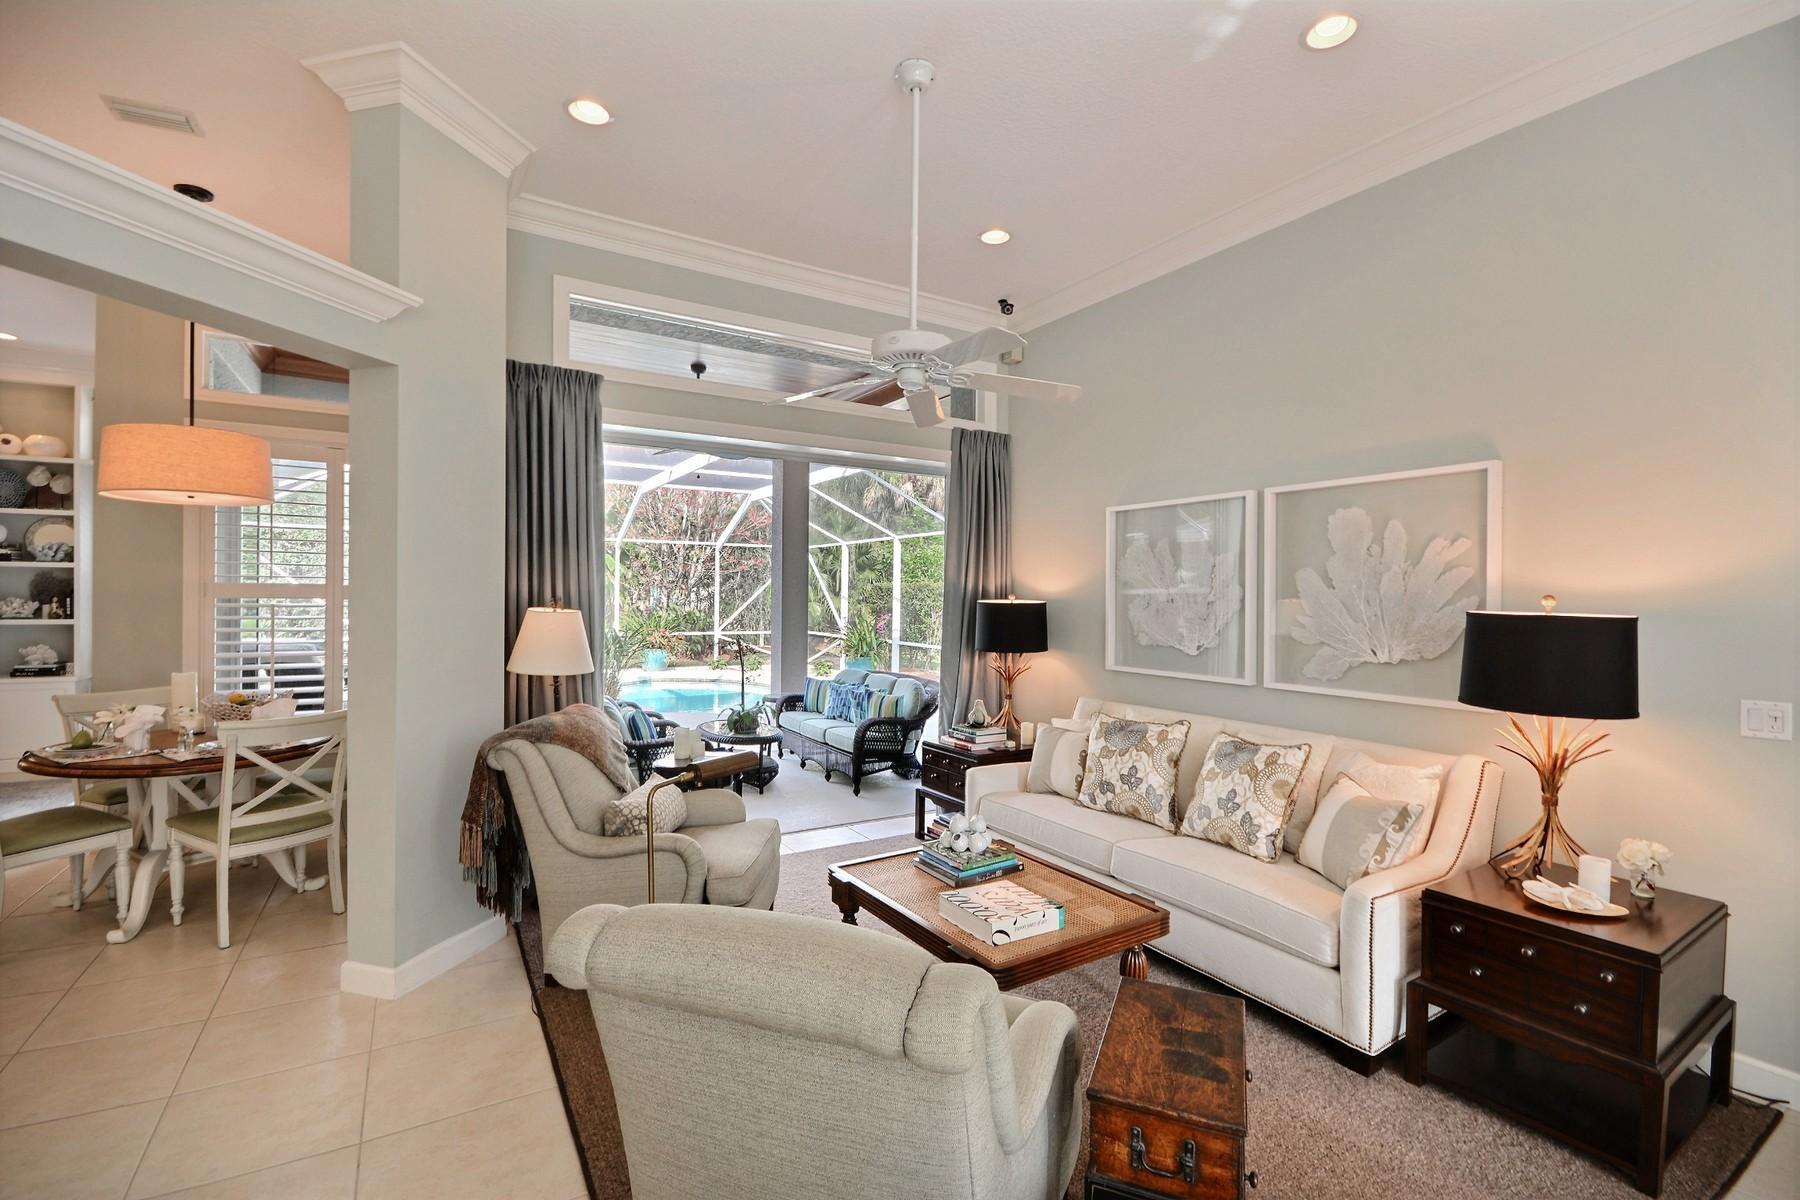 獨棟家庭住宅 為 出售 在 Designer Showcase in Ansley Park 1165 Ansley Avenue Vero Beach, 佛羅里達州, 32968 美國